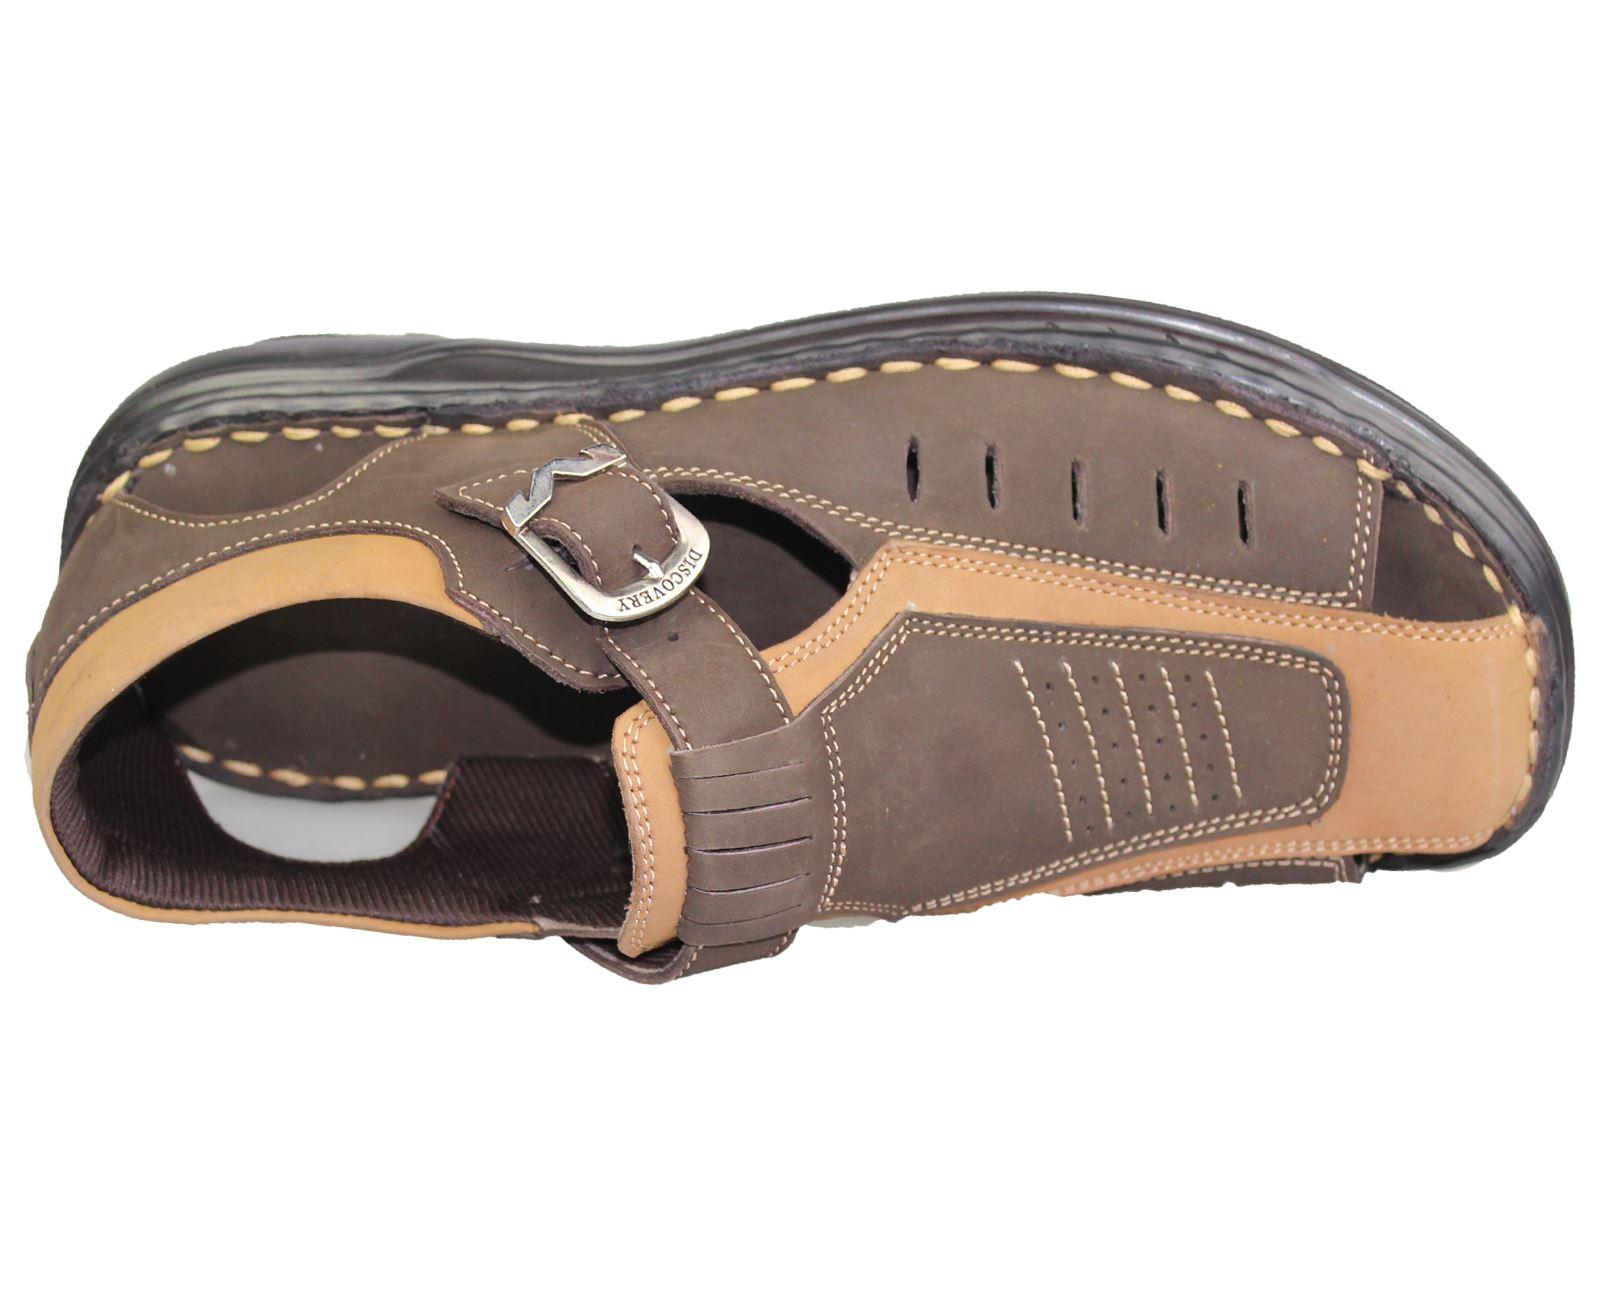 Mens-Buckle-Fastening-Sandals-Flat-Beach-Walking-Fashion-Casual-Summer-Slipper miniatura 11